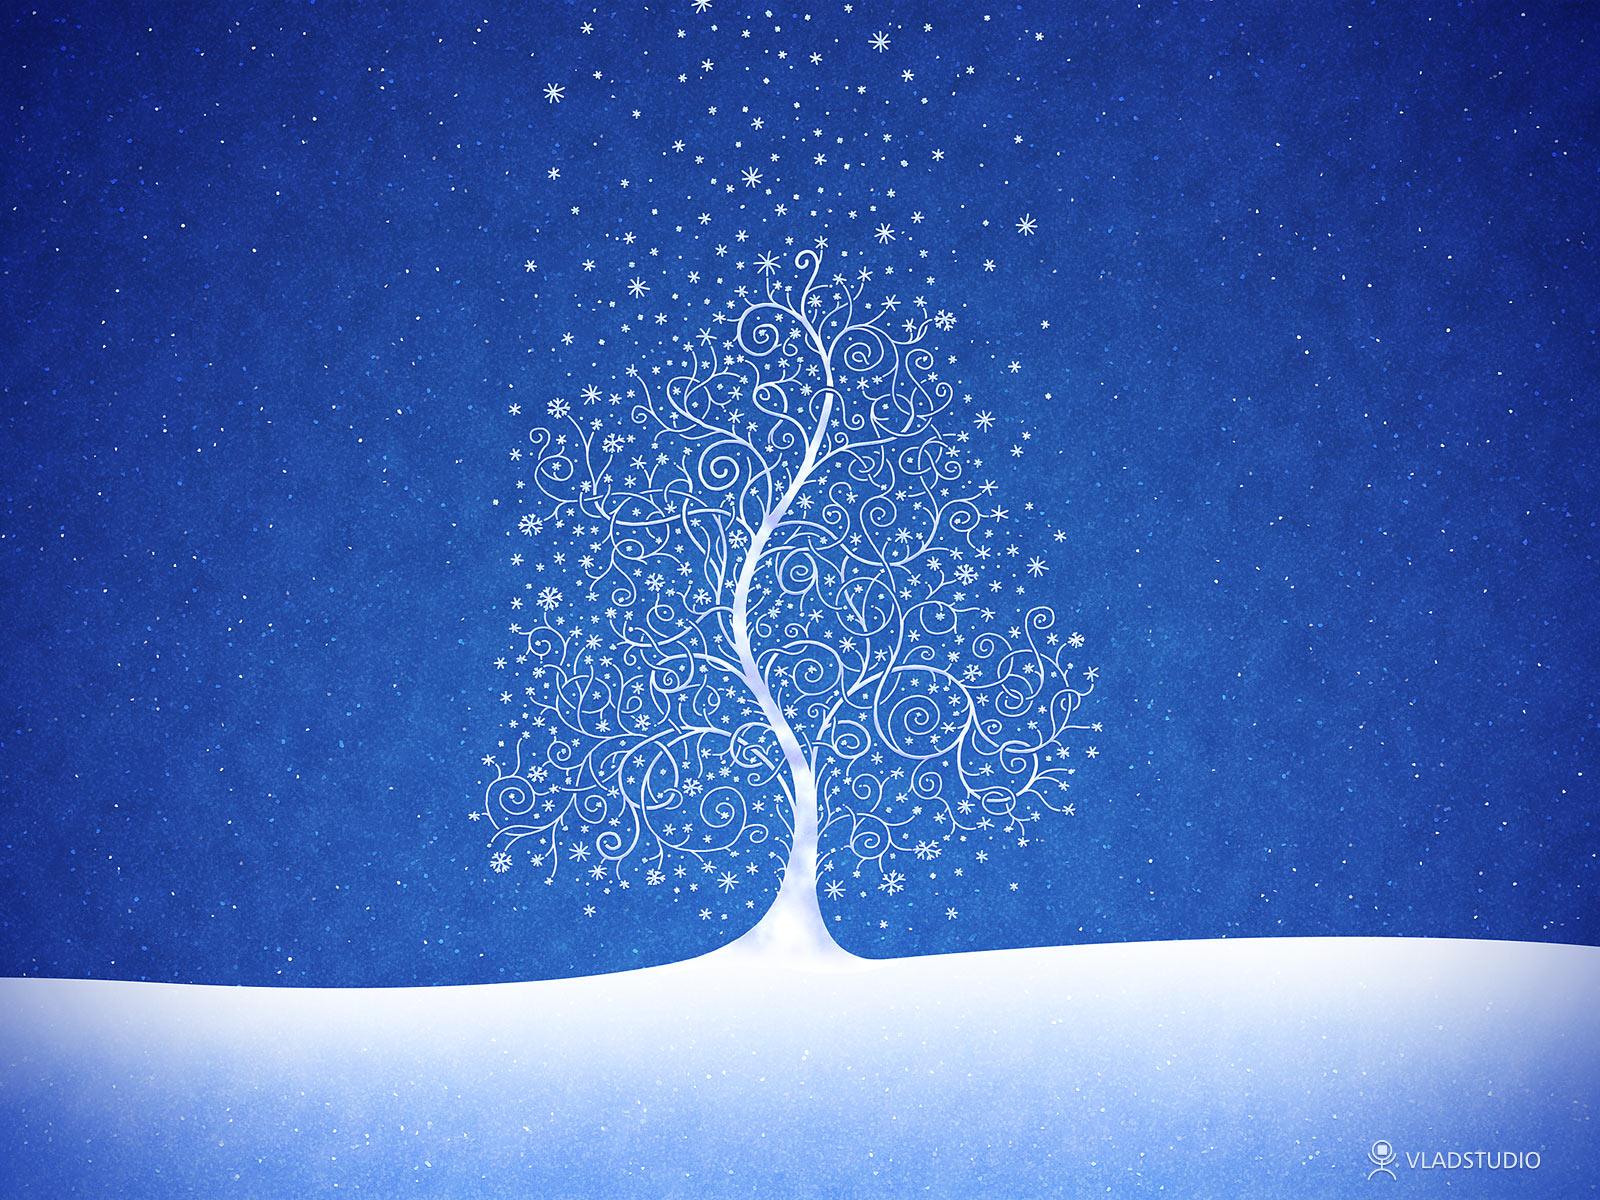 Holidays Christmas Seasonal Festive Hd Wallpaper 1467018: Carta & Carta: Come Fare I Fiorcchi Di Neve Di Carta